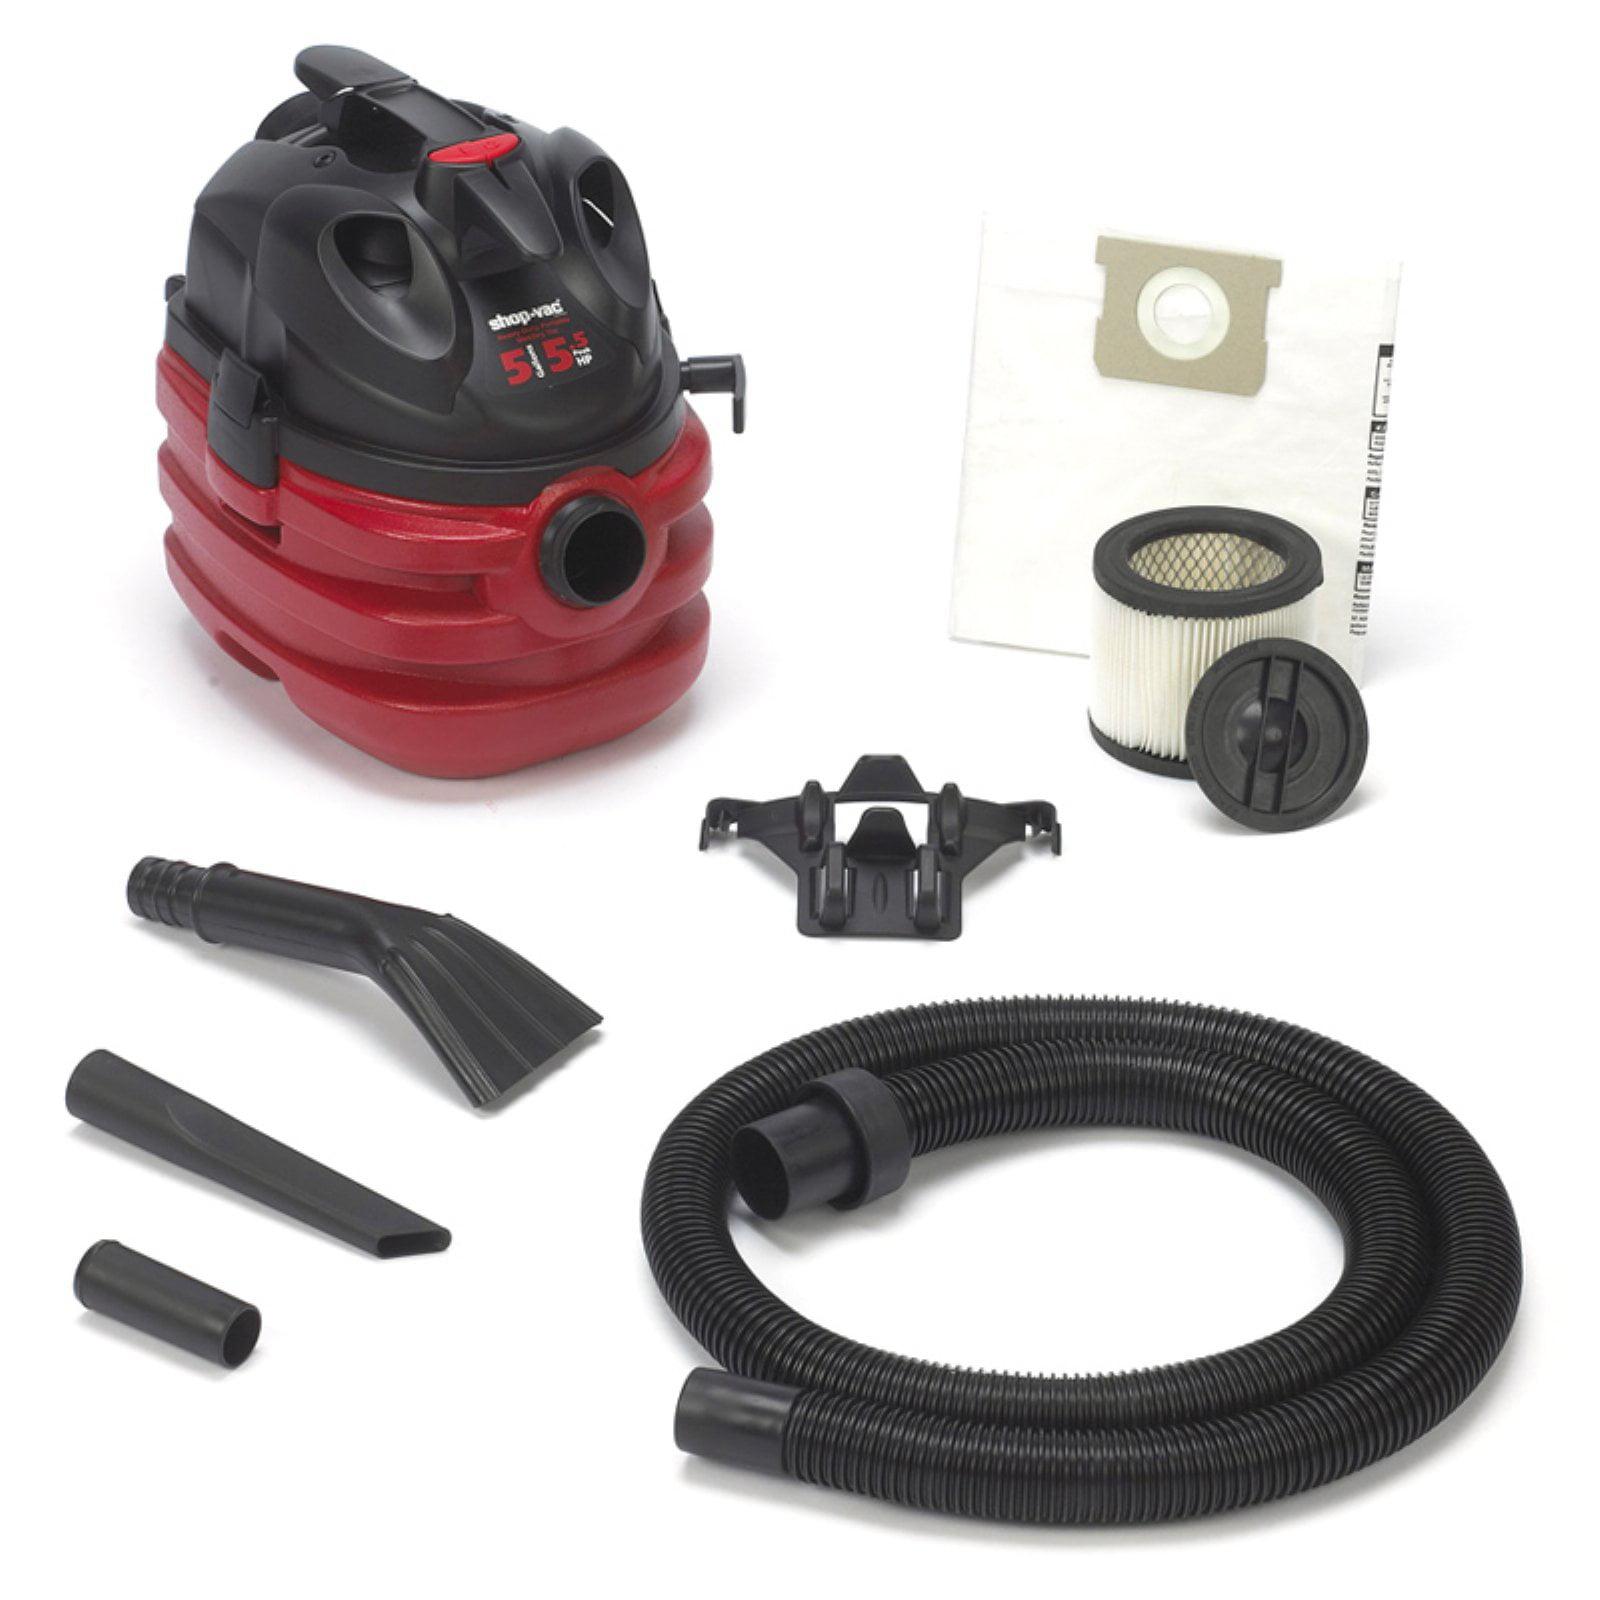 Shop Vac 5 Gallon 5.5 HP Heavy Duty Portable Wet & Dry Vac by Shop-Vac